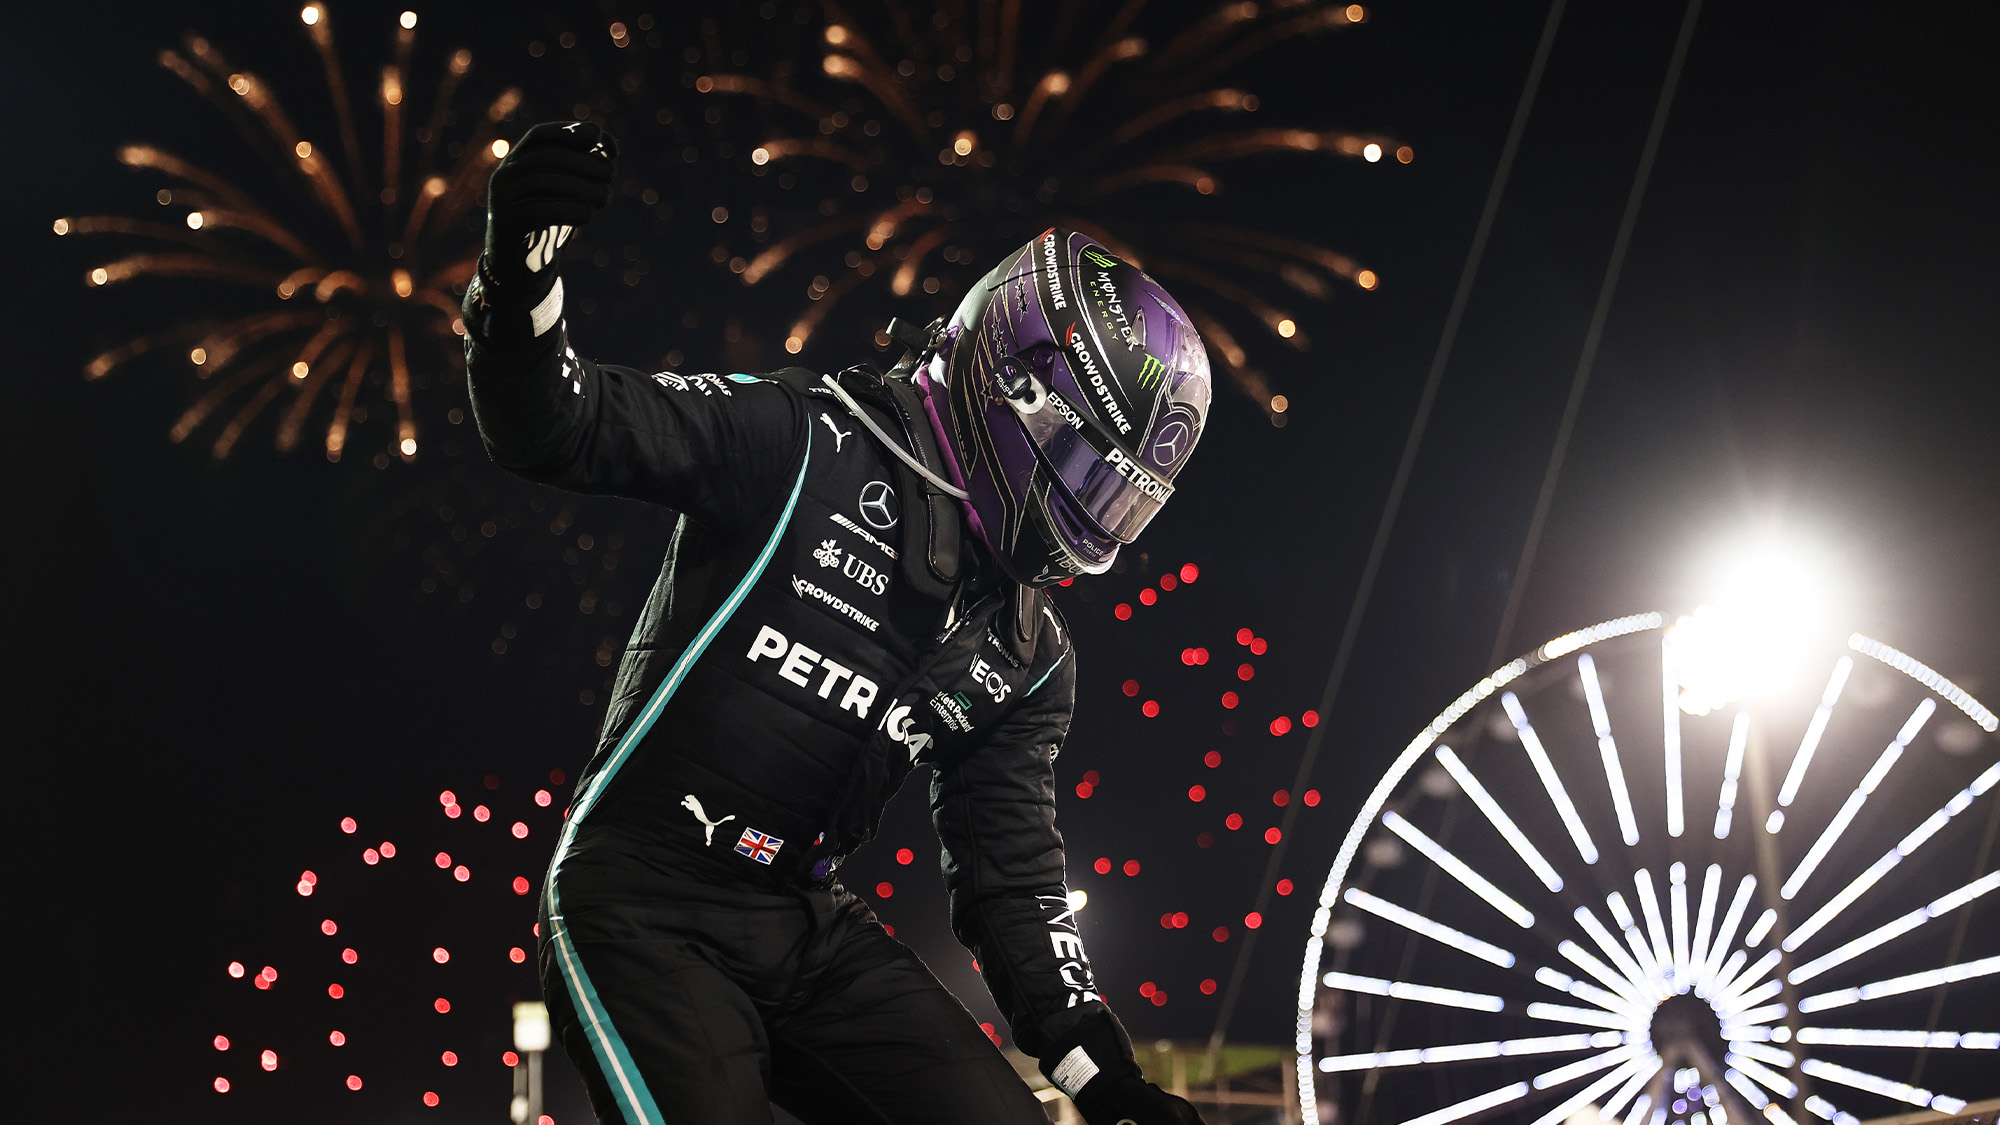 Lewis Hamilton celebrated victory in the 2021 Bahrain Grand Prix